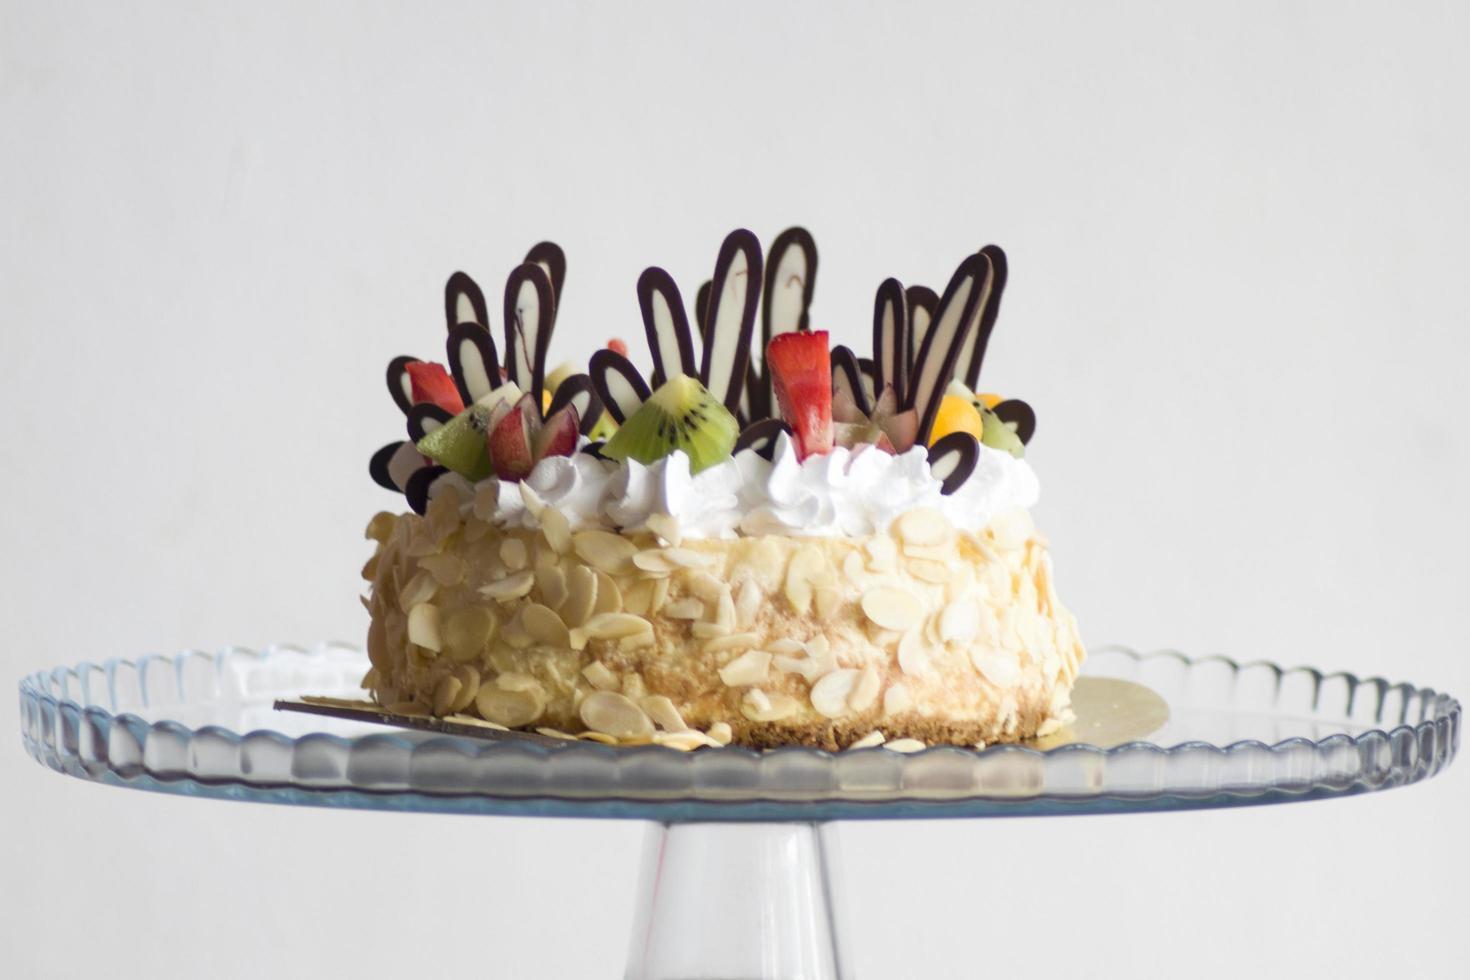 bruin en wit glazuur bedekt cake met fruit foto